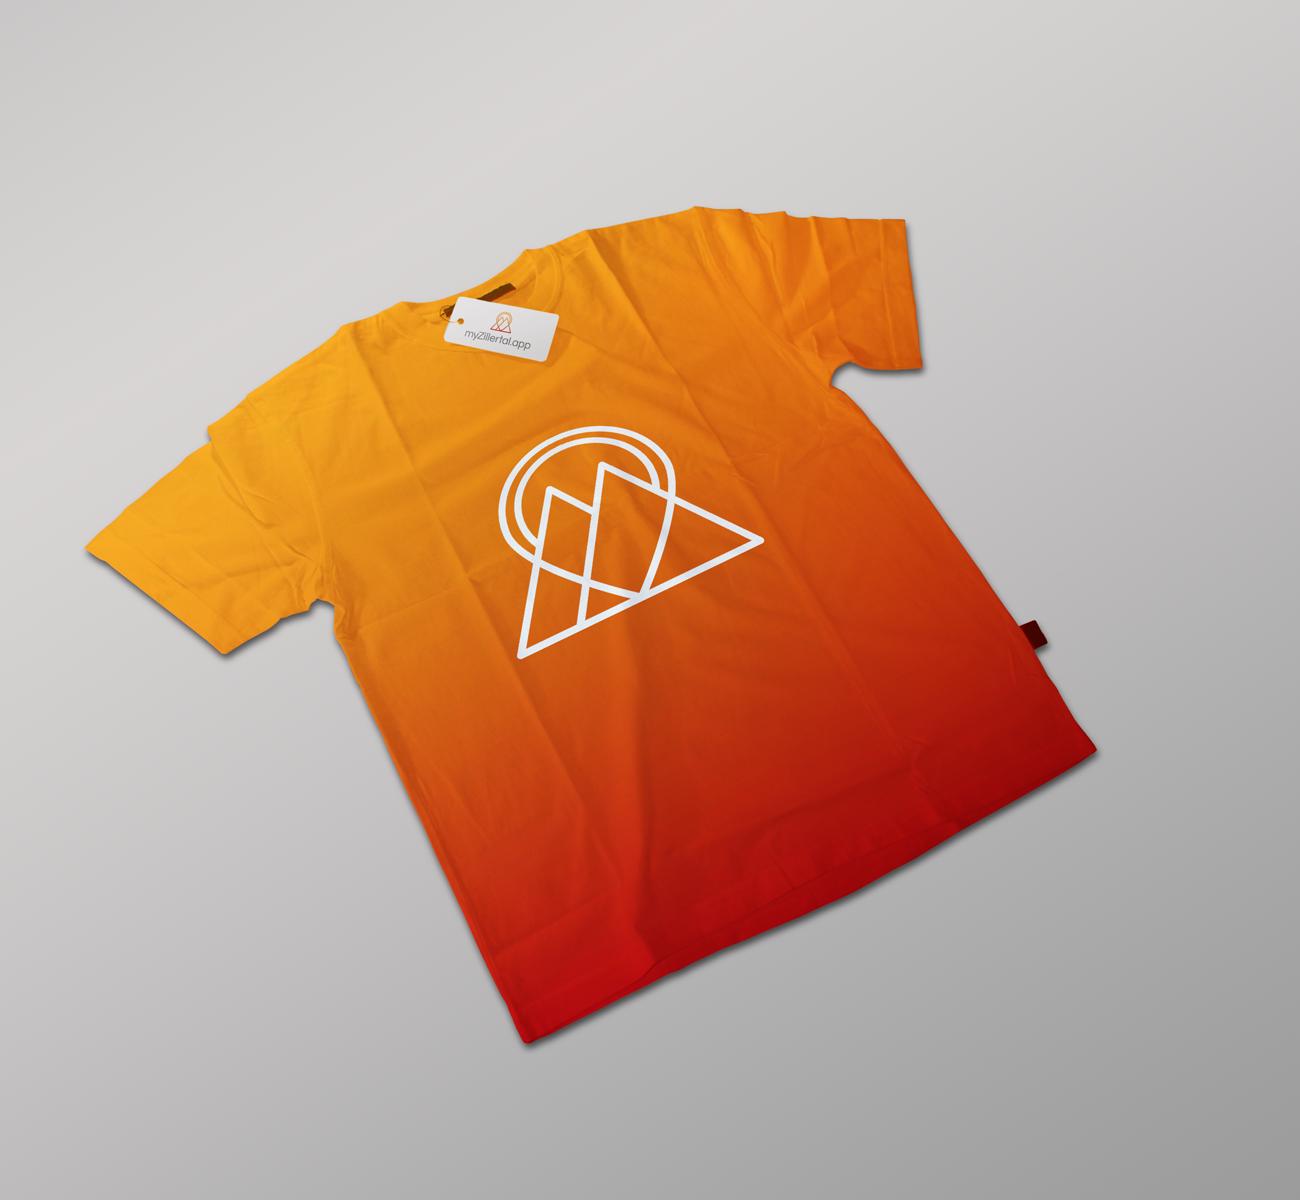 MZApp_Shirt_1300